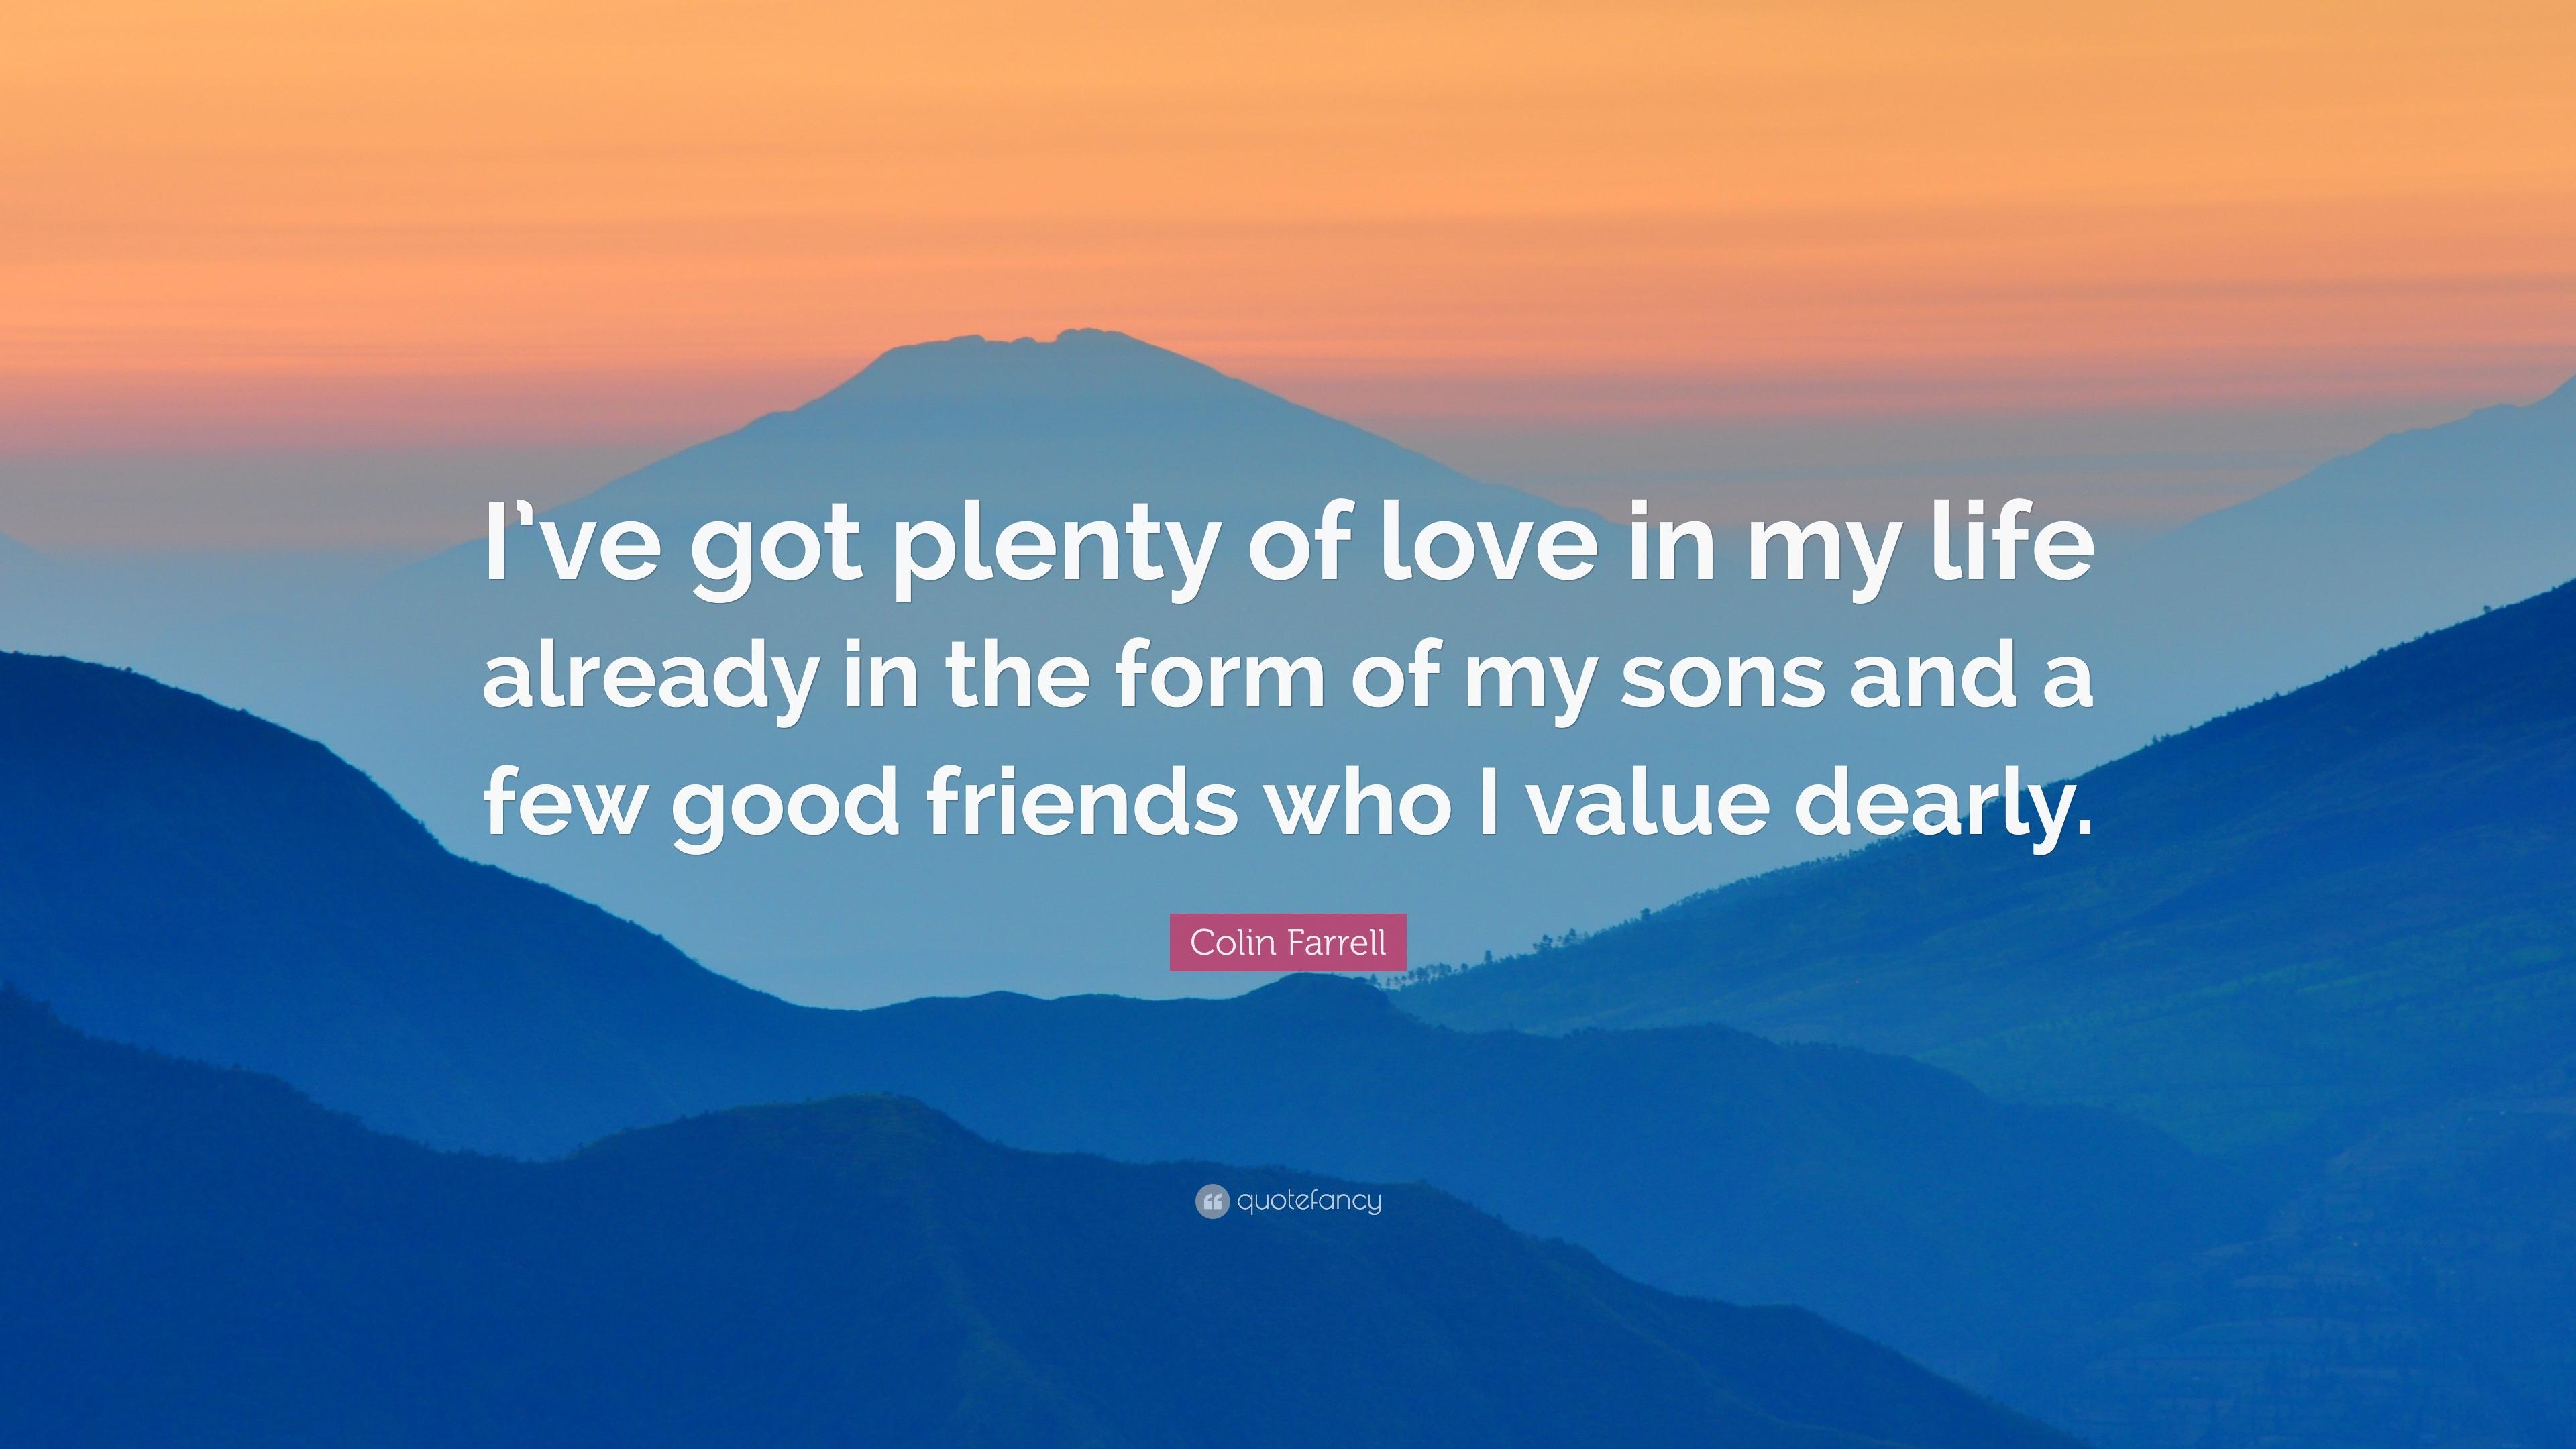 Colin Farrell Quote: U201cIu0027ve Got Plenty Of Love In My Life Already